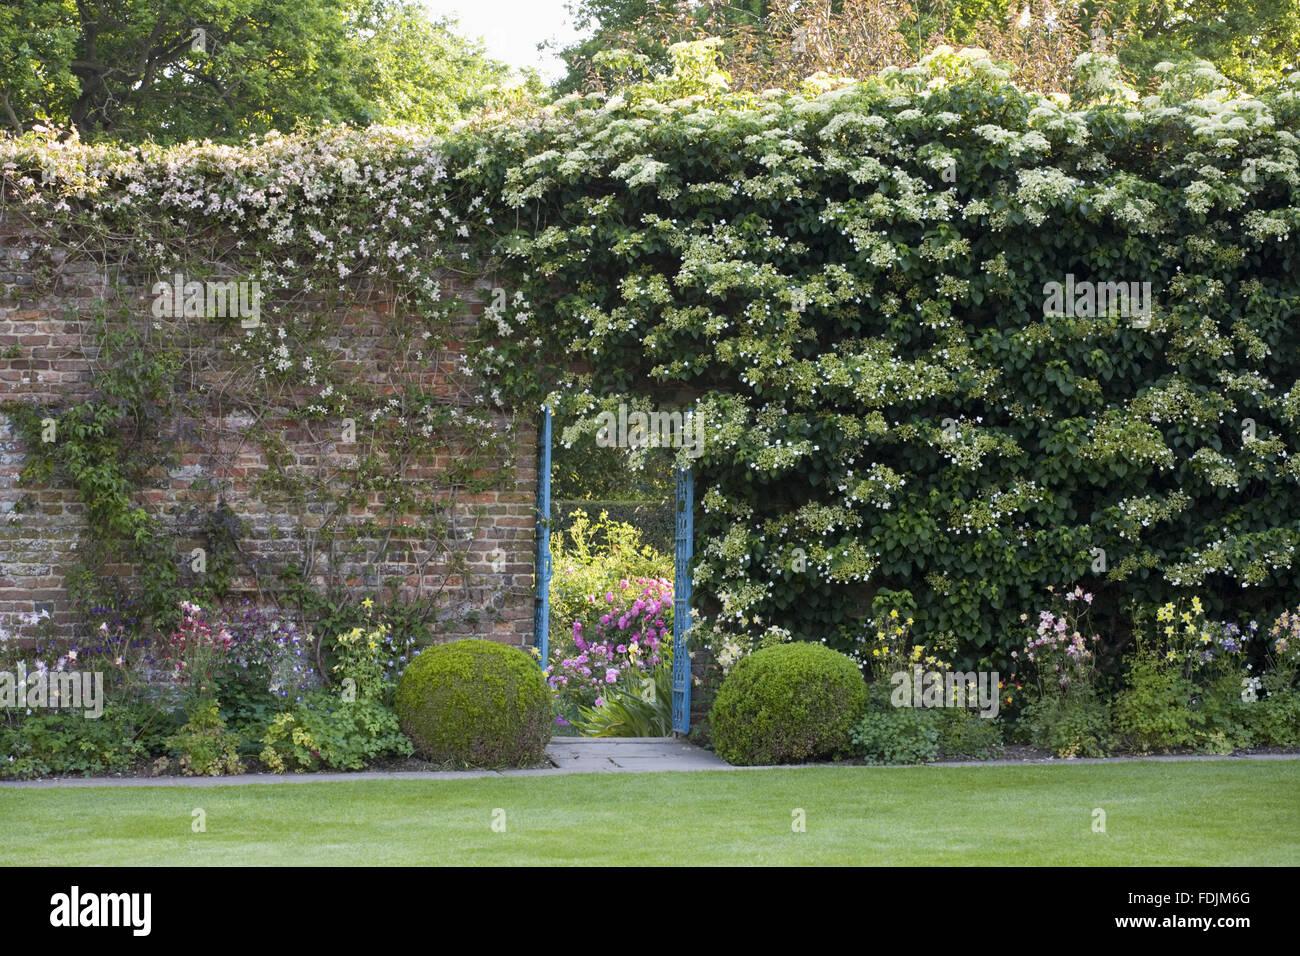 Hydrangea Petiolaris On The Wall Next To The Door To The Rose Garden At  Sissinghurst Castle Garden, Near Cranbrook, Kent.